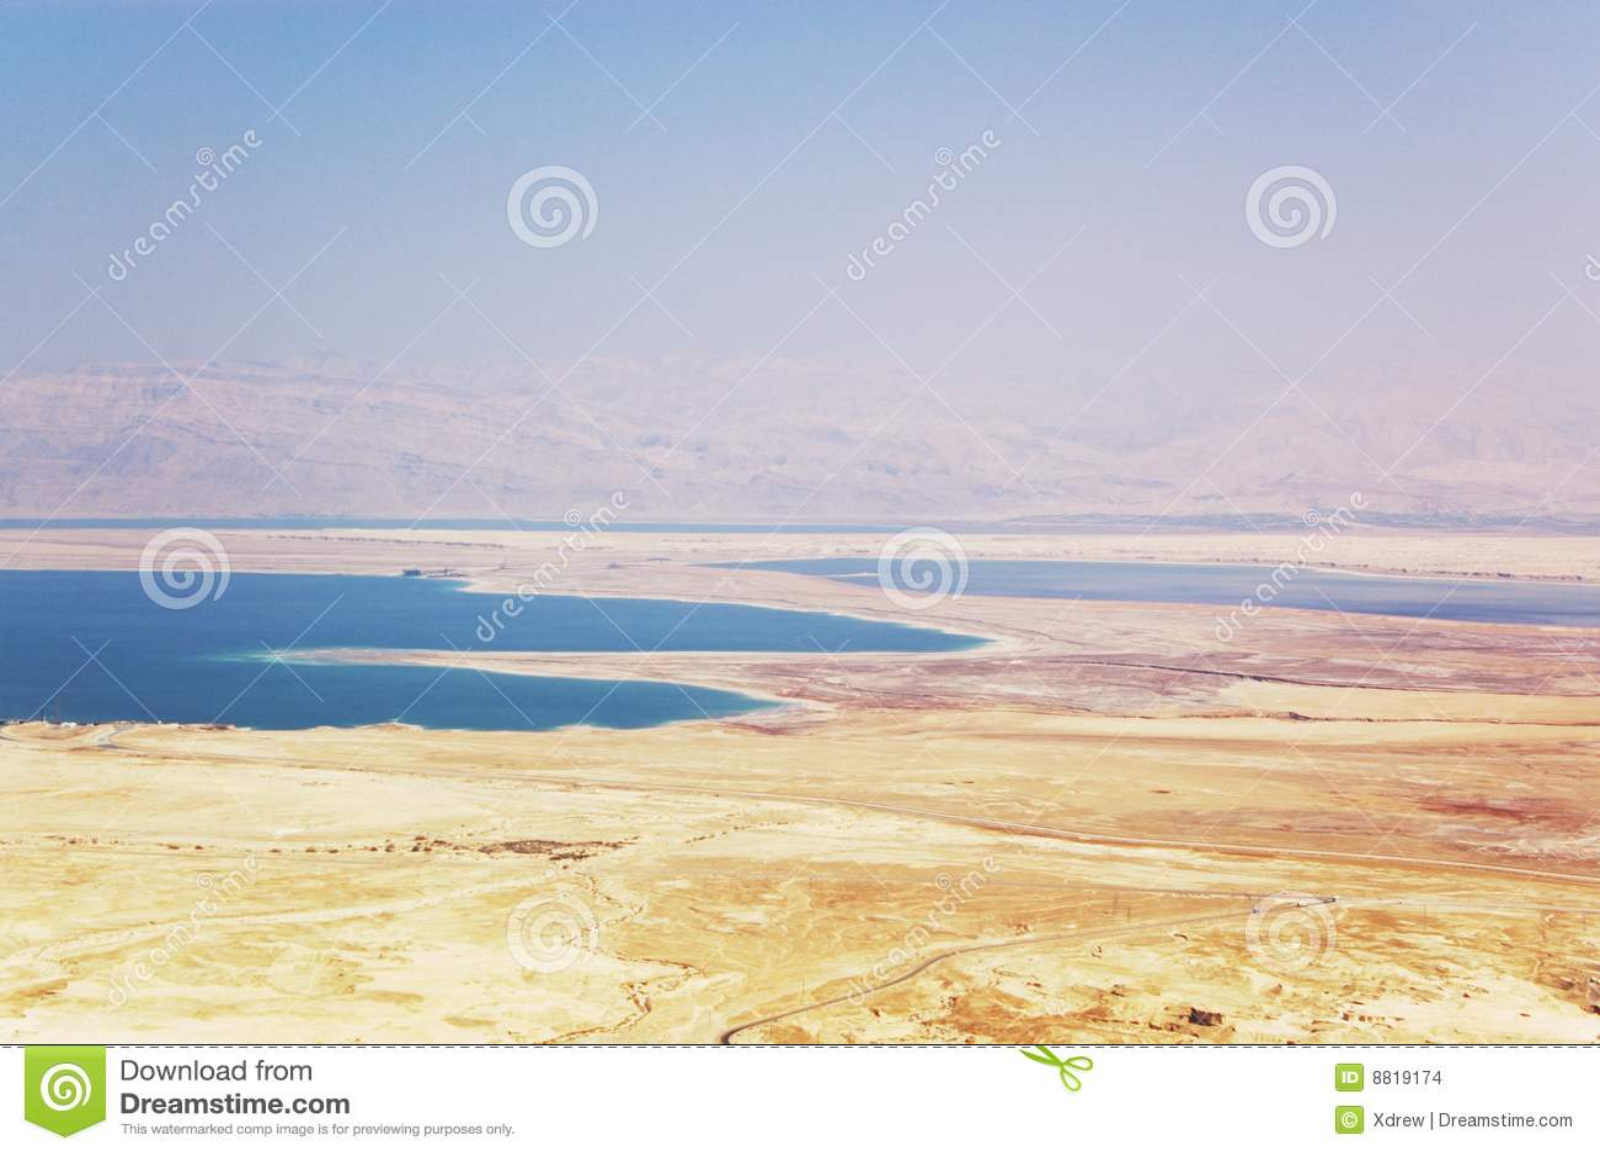 мертвое море judea deset